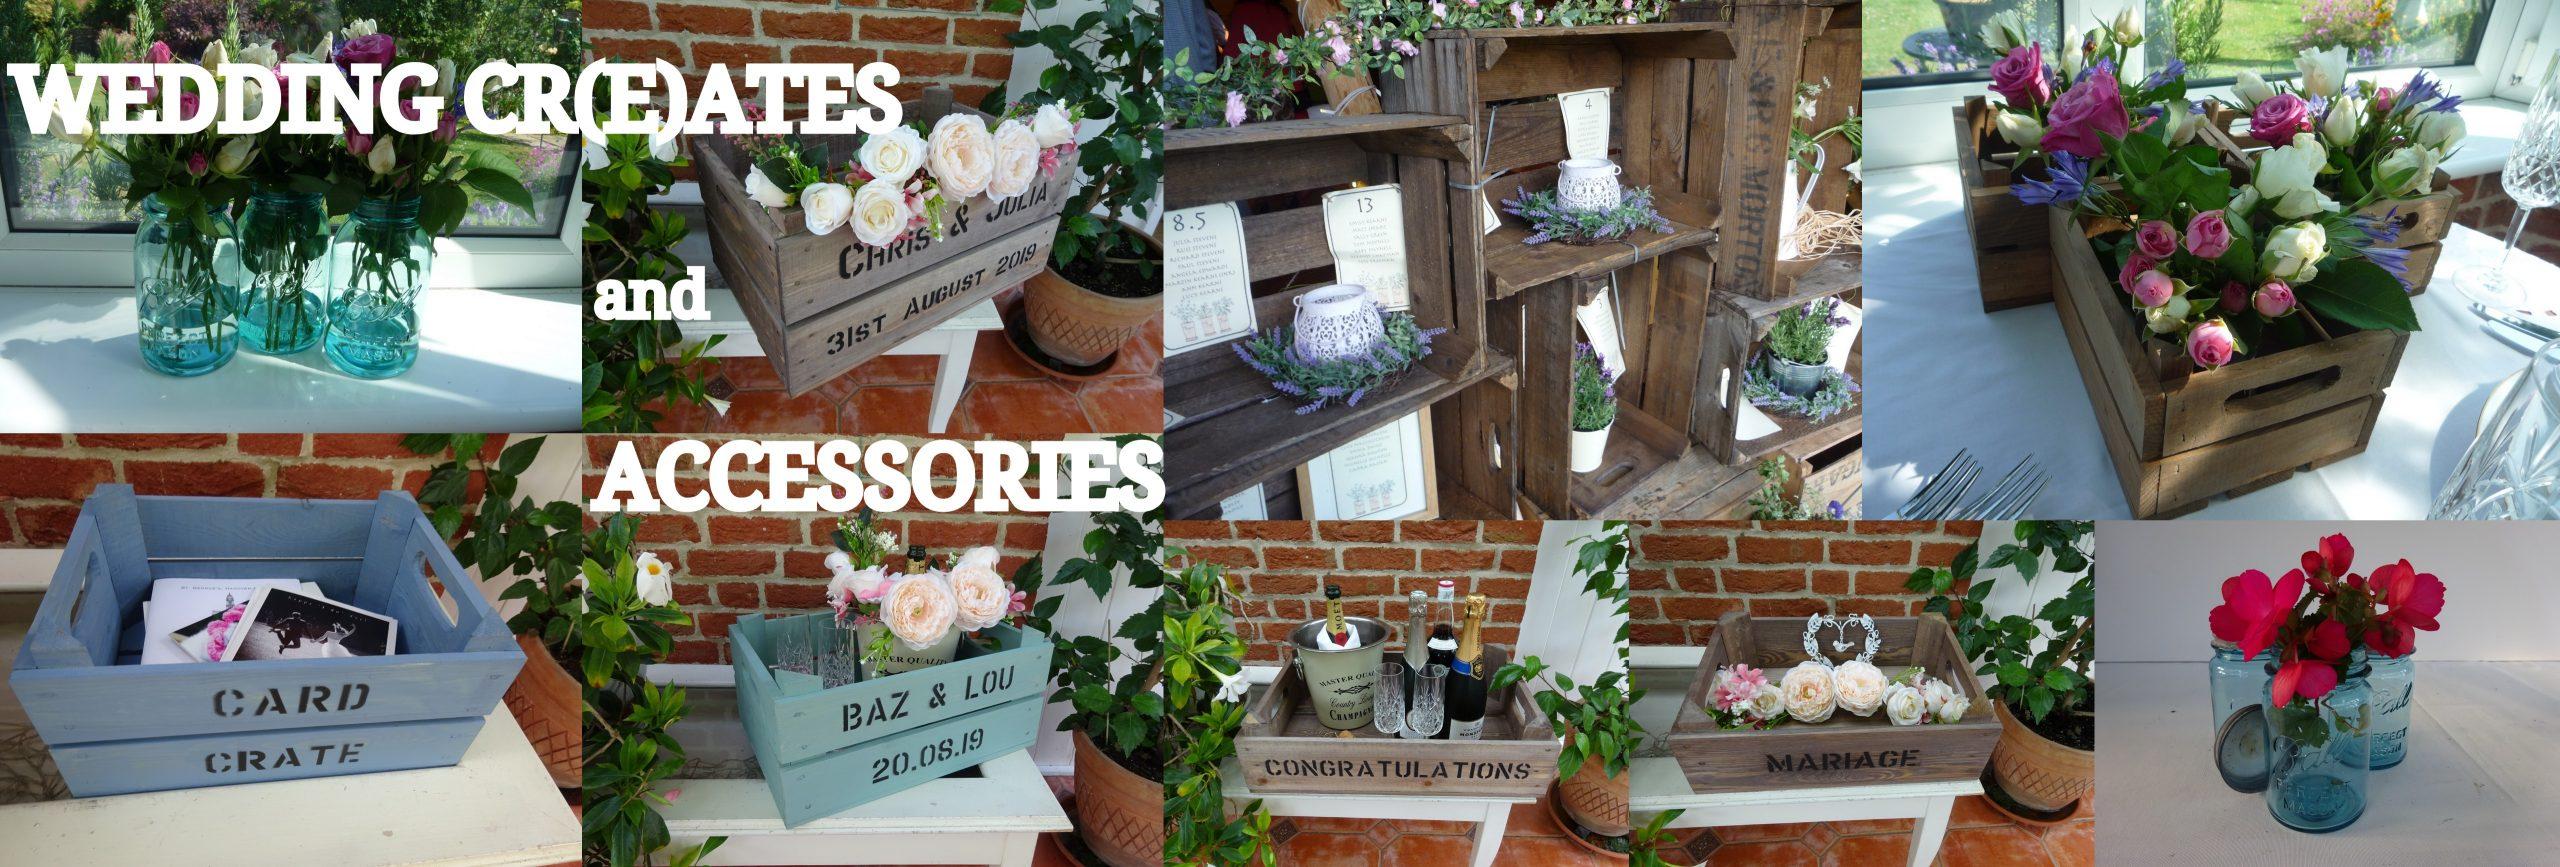 Wedding Crates